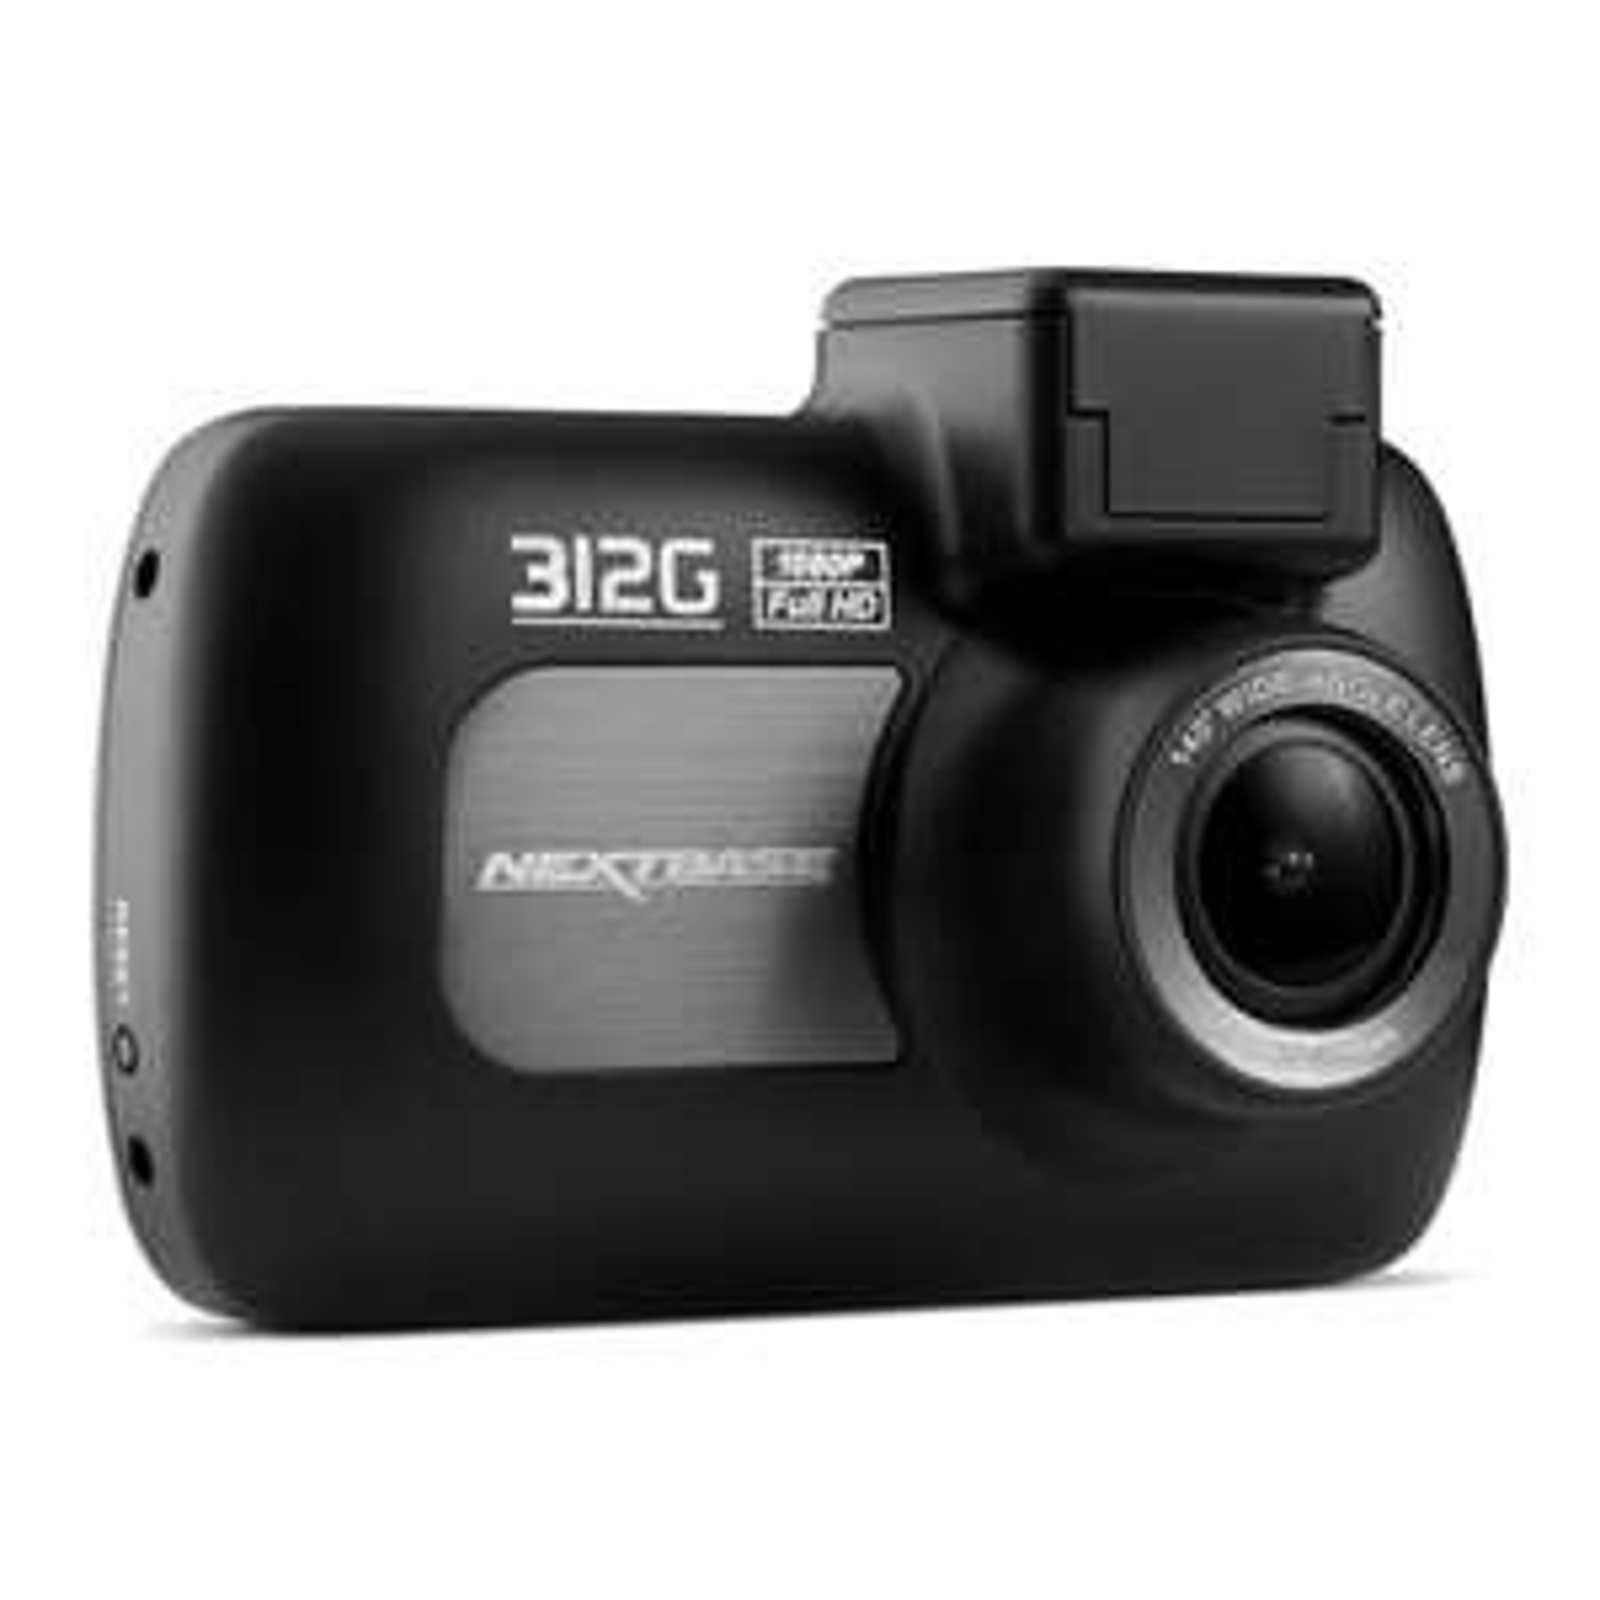 "Nextbase 312G Dash Cam 2.7"" LED Car Recorder Night Vision - £45 inc P+P, Ebay @  velocityelectronics"